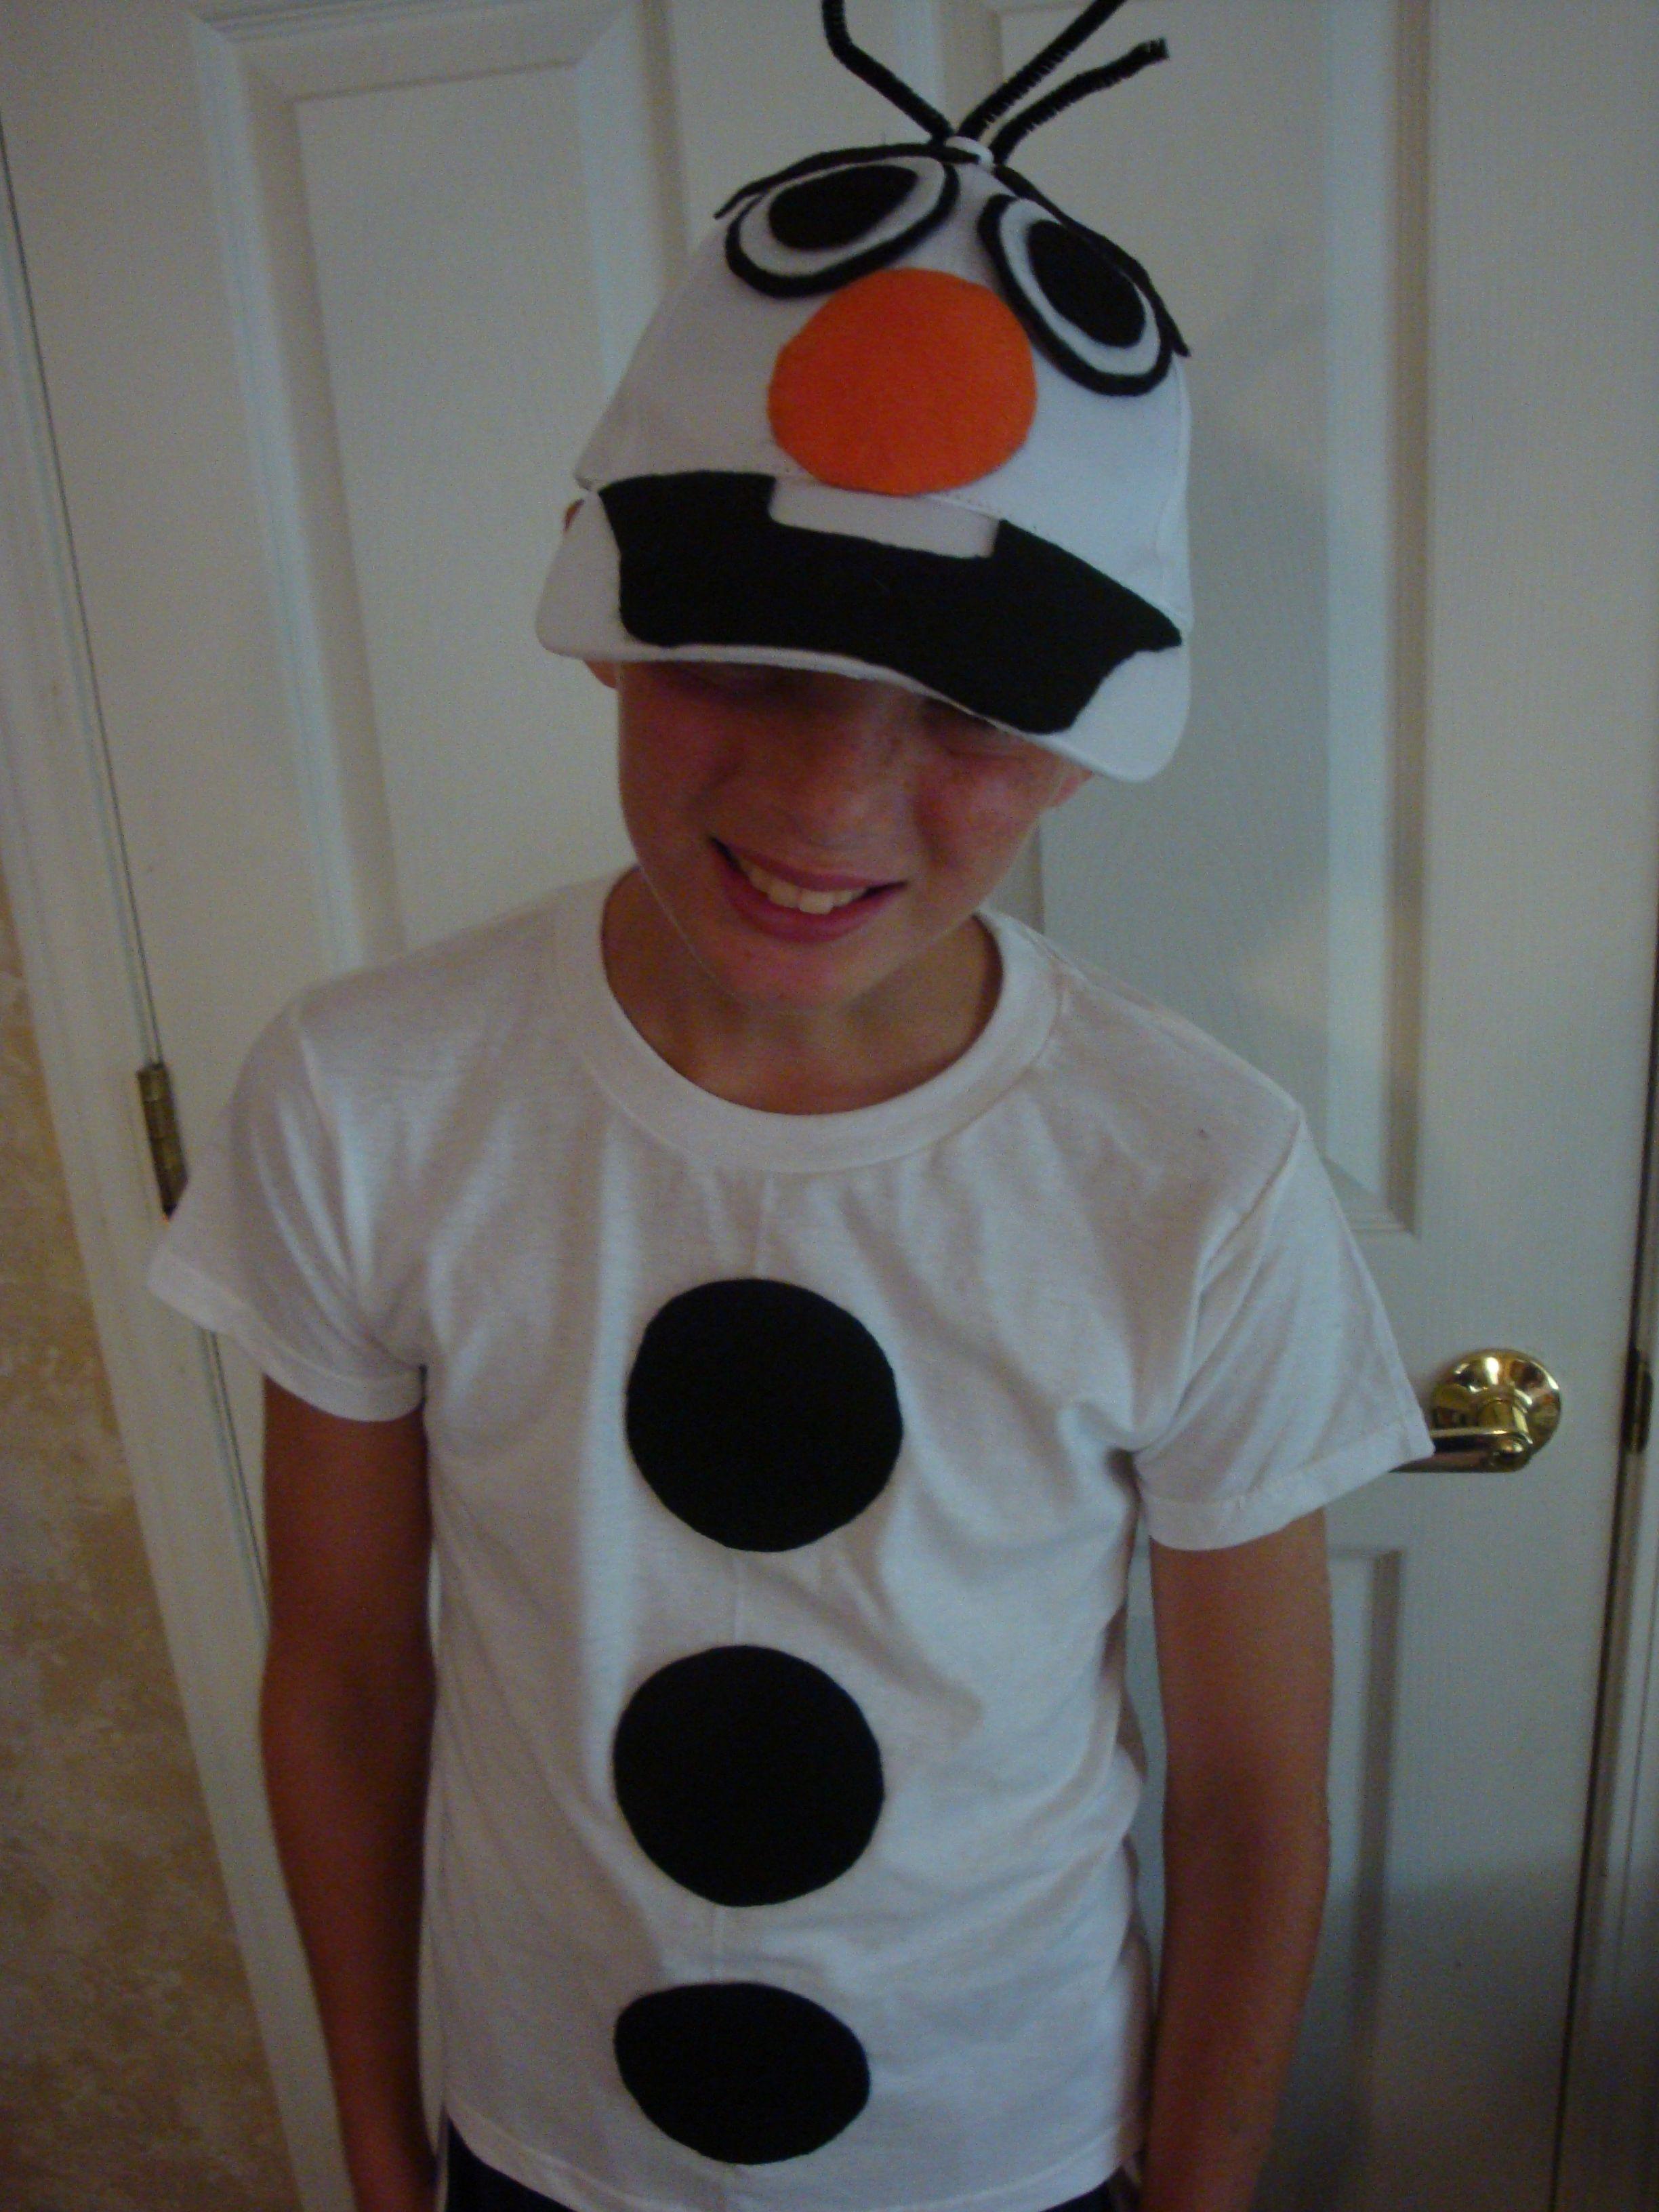 Olaf the snowman halloween costume diy handmade do it yourself olaf olaf the snowman halloween costume diy handmade do it yourself olaf halloween costume solutioingenieria Image collections